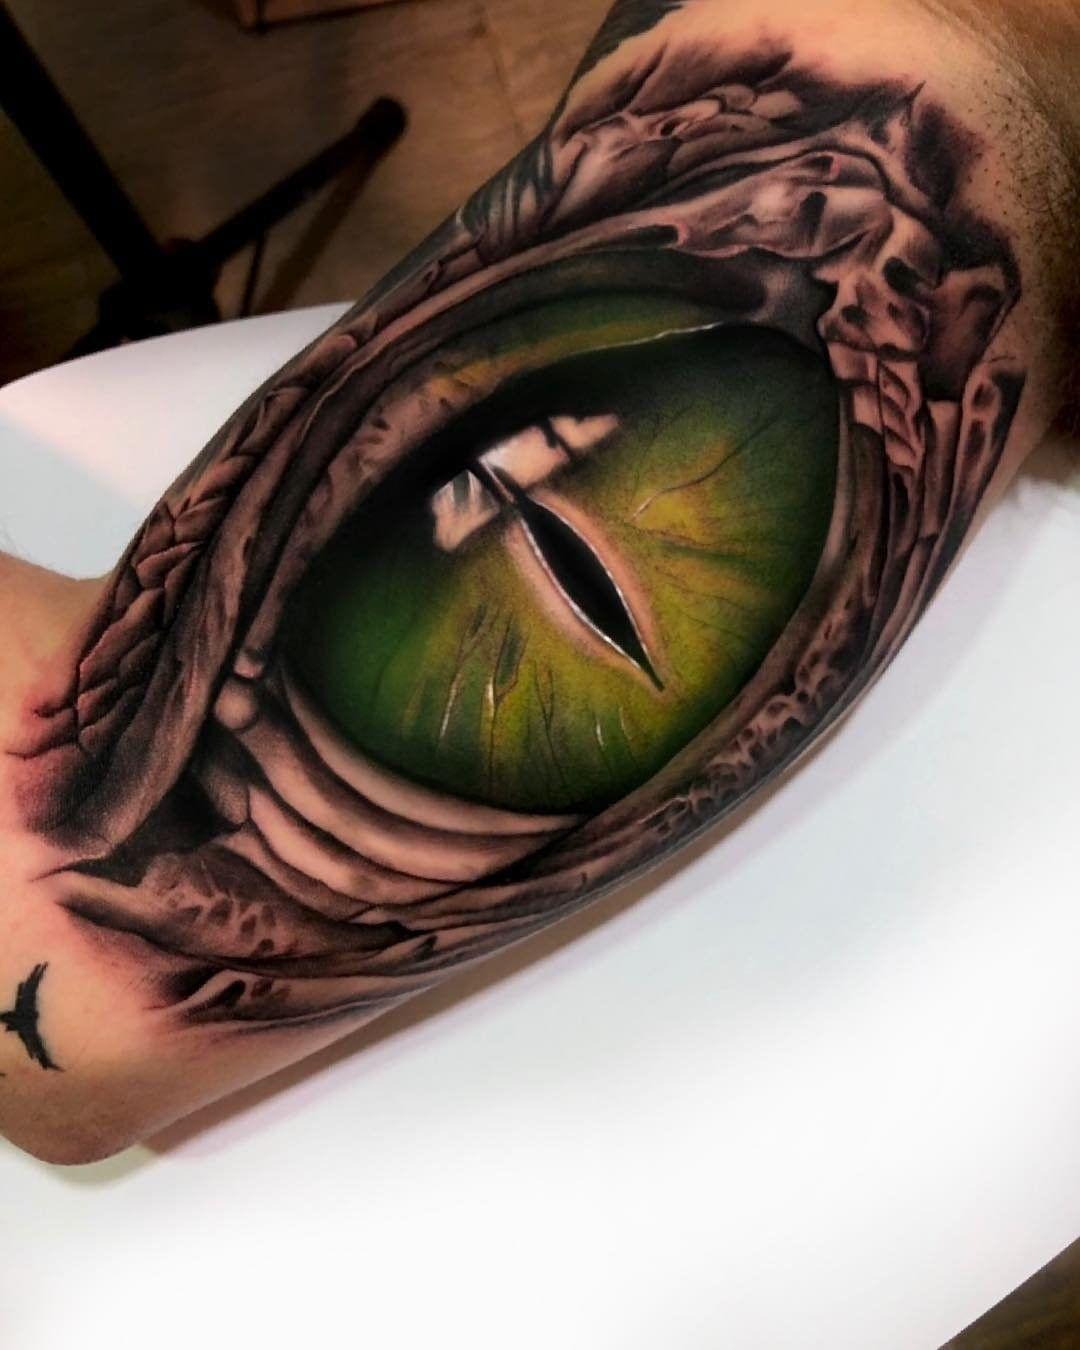 followforfollow,berlin,followmeciudadreal,ciudadreal,tomelloso,almagro,puertollano,tatuajesenpuertollano,tatuajesendaimiel,ciudadrealtattoo,ciudadrealtatuajes,tatuajesciudadreal,follow,ciudadrealtatuajes,puertollano,ciudadreal,tattoos,ciudadrealtattoo,tattooers,besttattooers,juantabasco,ciudadrealsetatua,ink,tatuajes,realismo,realistictattoo,ciudadrealtattoo,tatuajesenpuertollano,traditionaltattoos